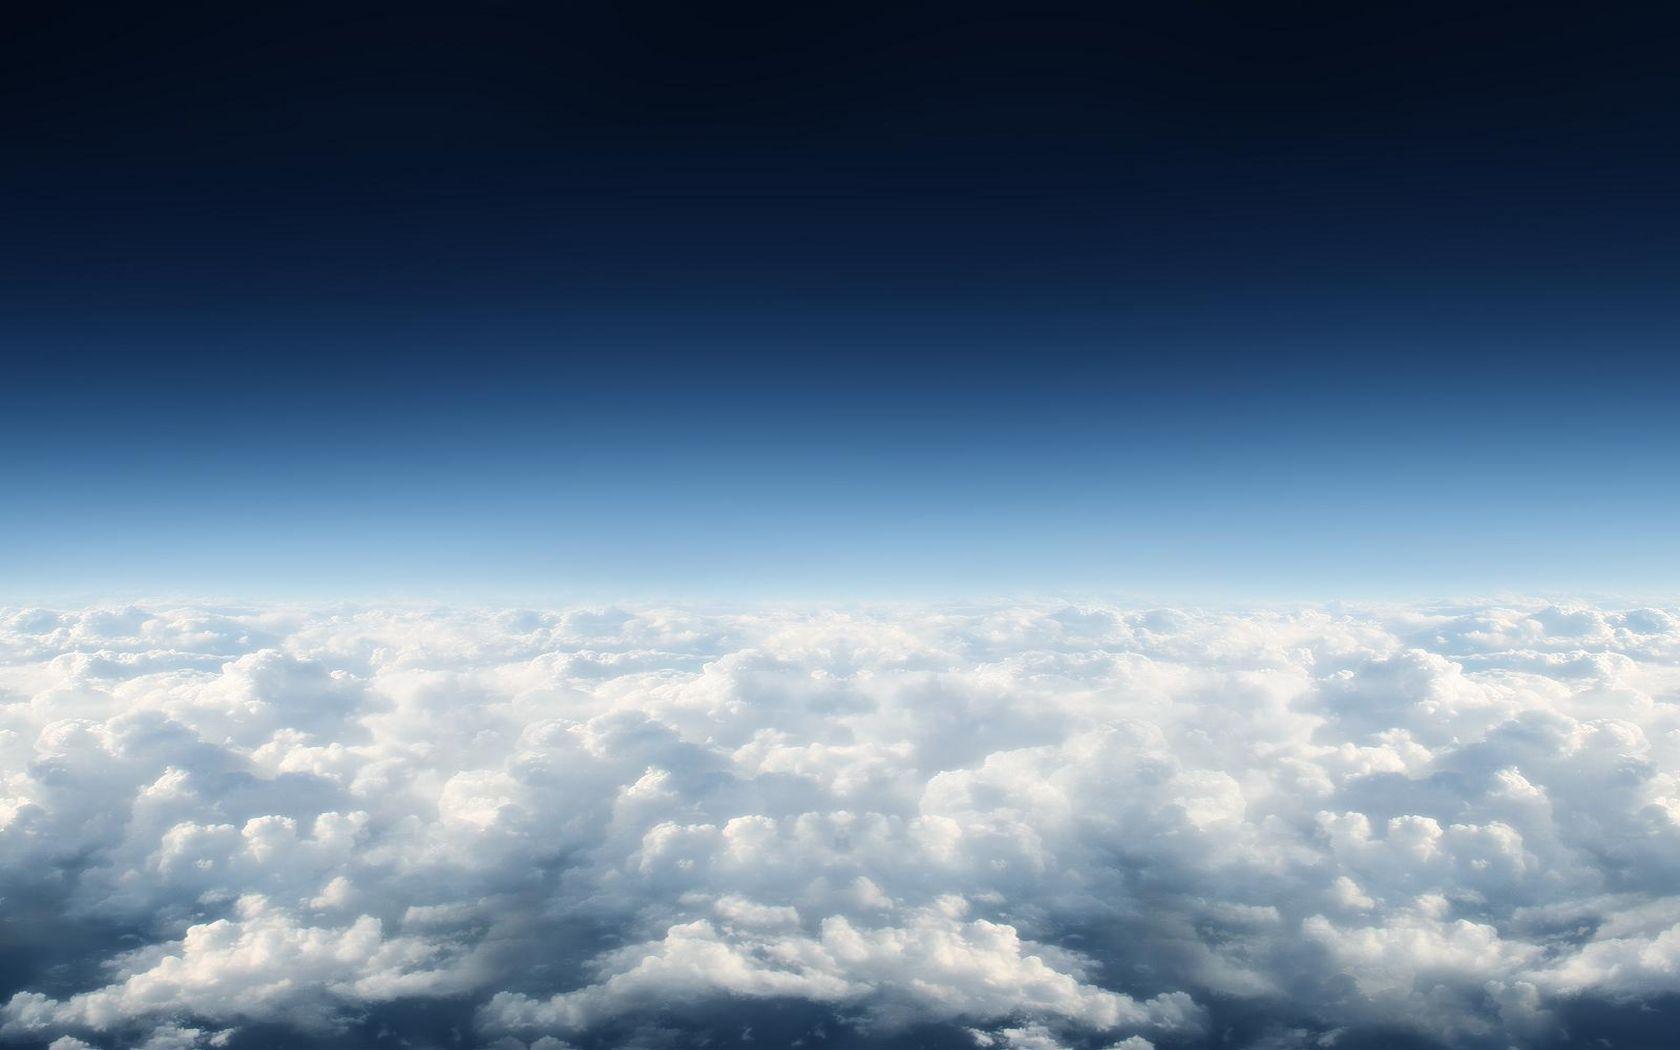 File:Sea of clouds.jpg - Wikimedia Commons